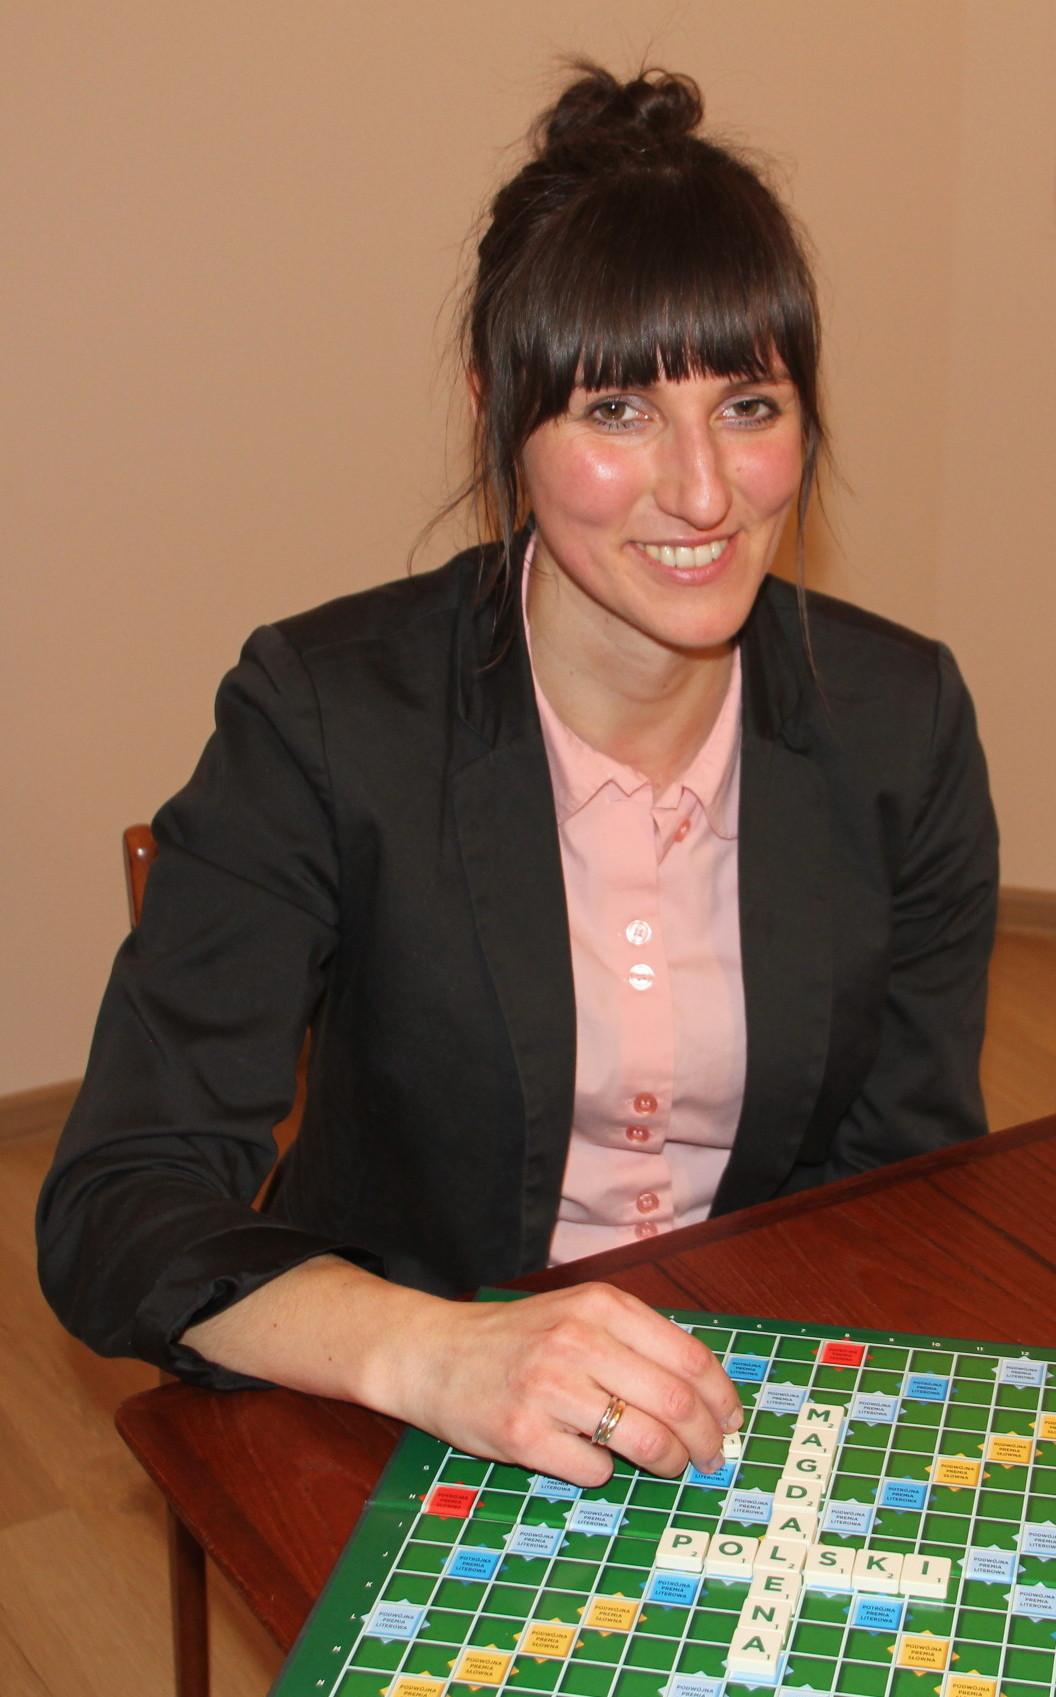 Magda Polka